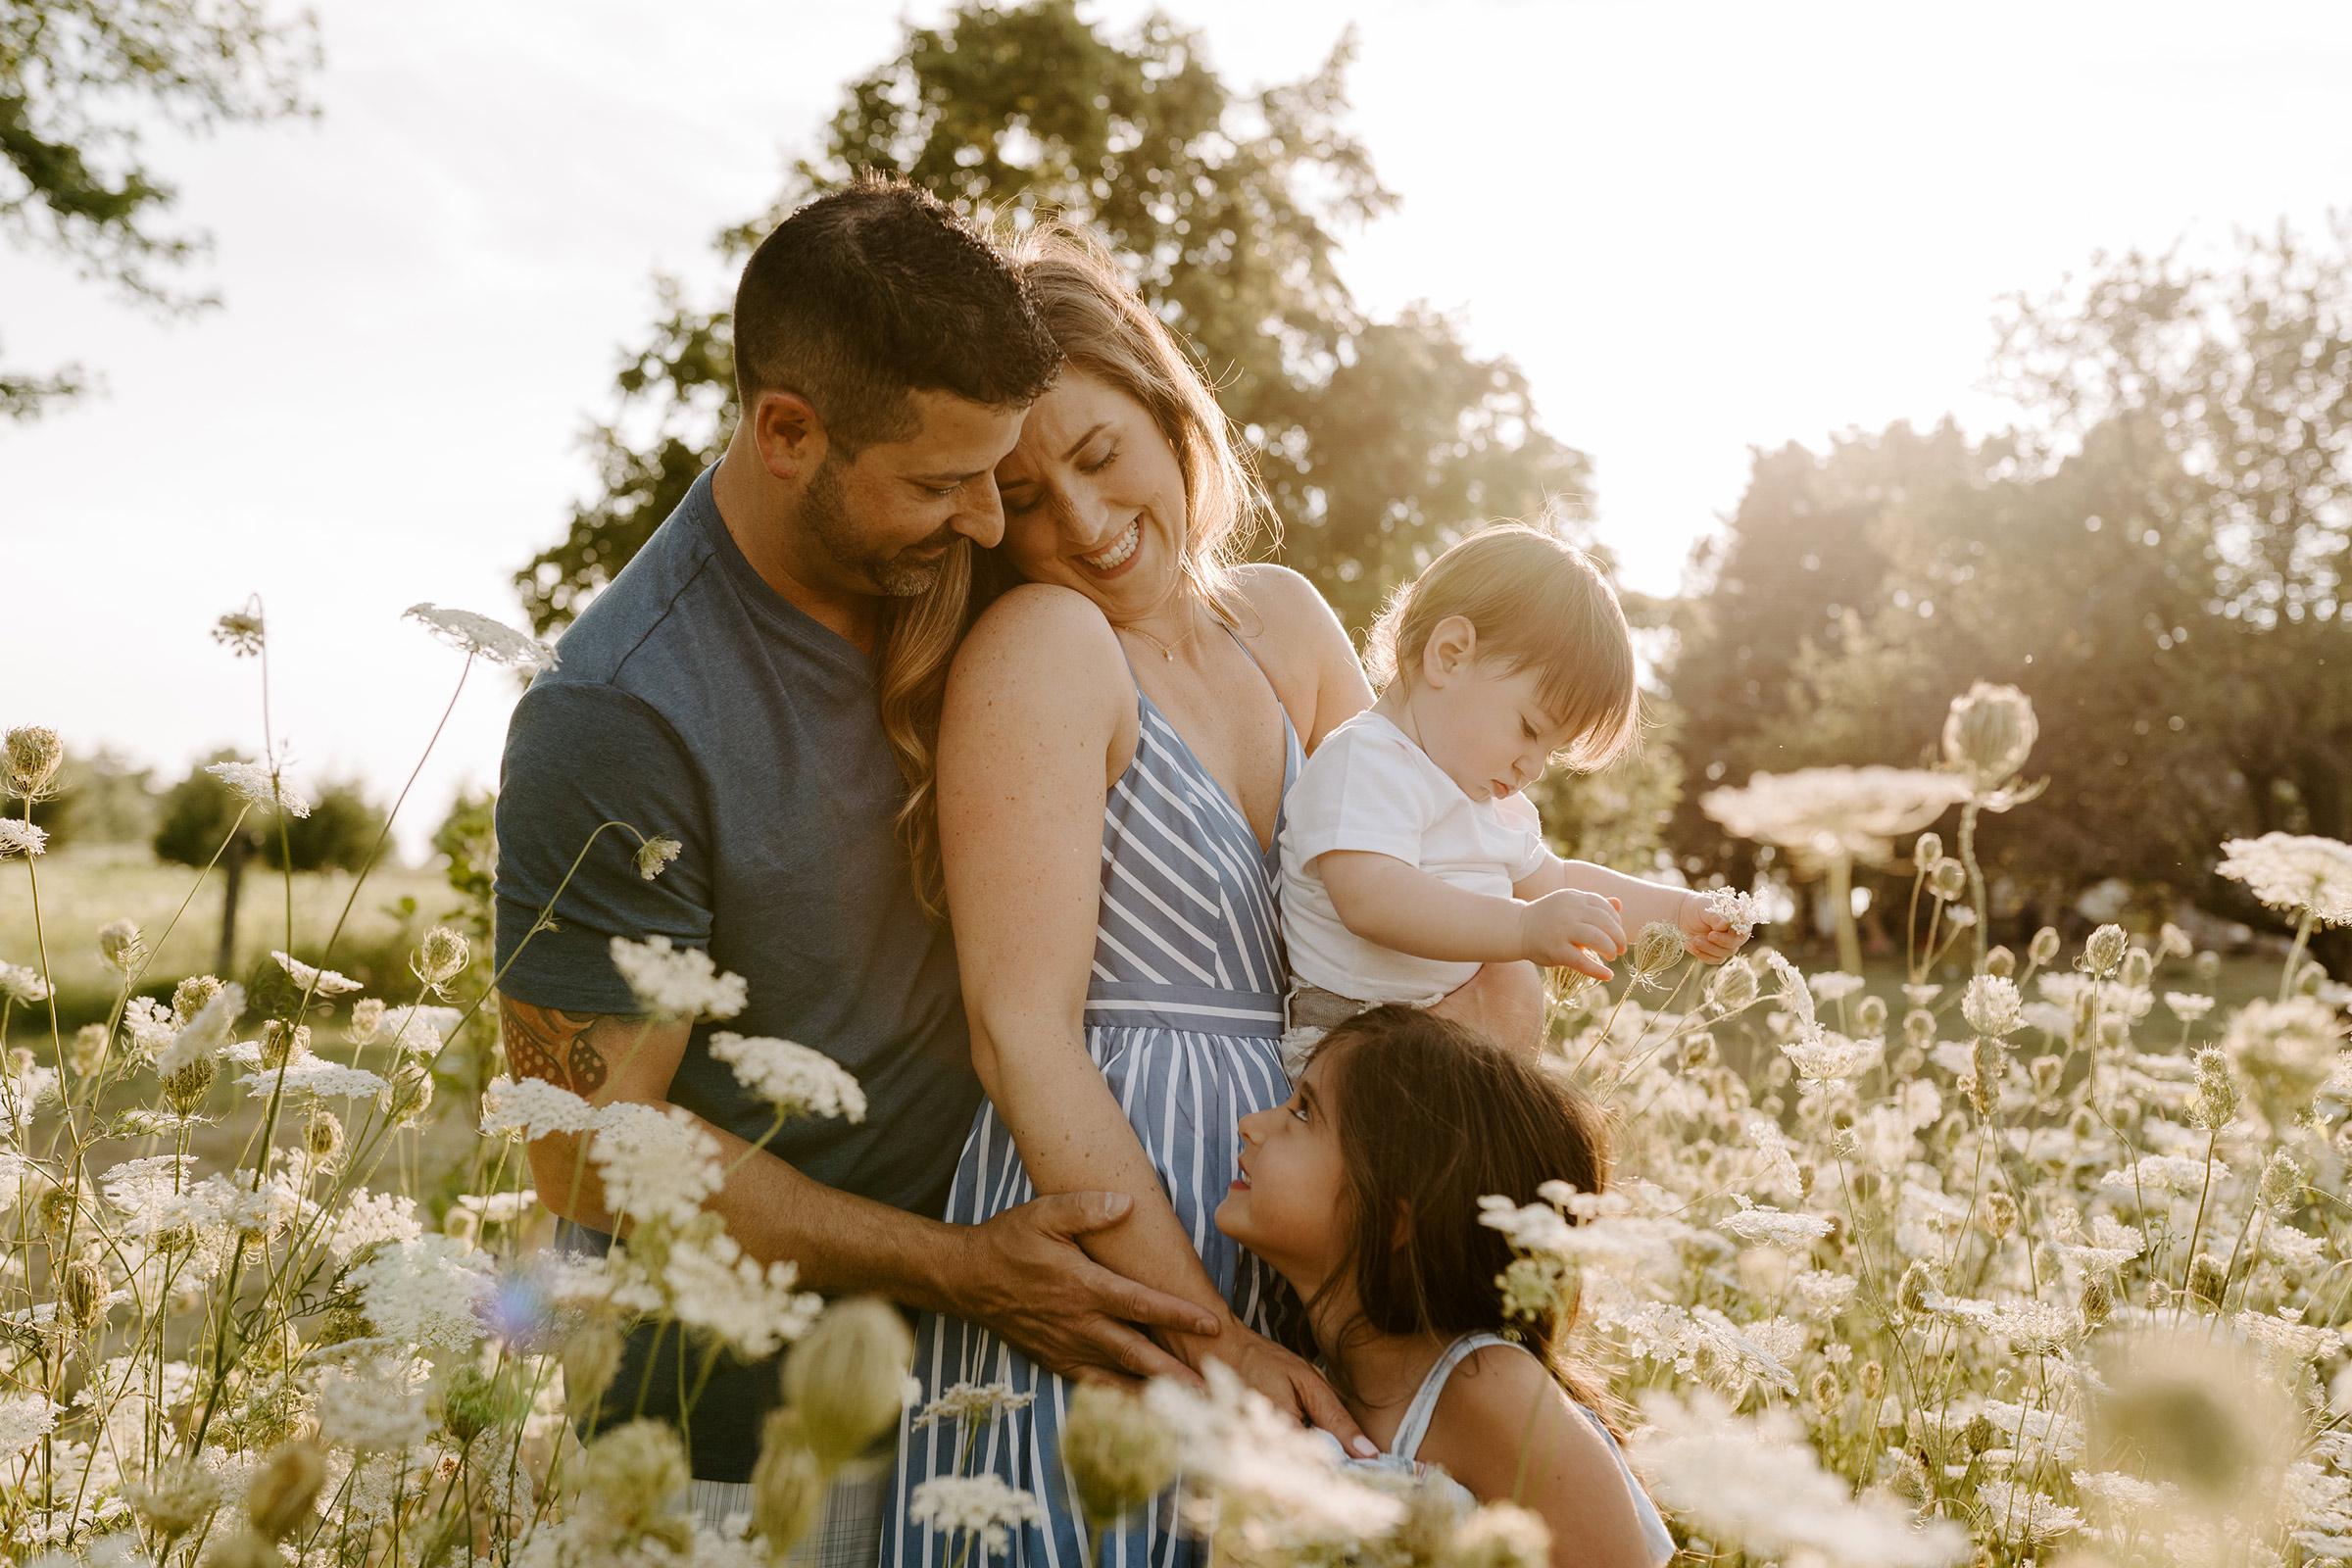 natale-family--walking-through-flowers-iris-aisle--winterset-iowa-raelyn-ramey-photography-62.jpg